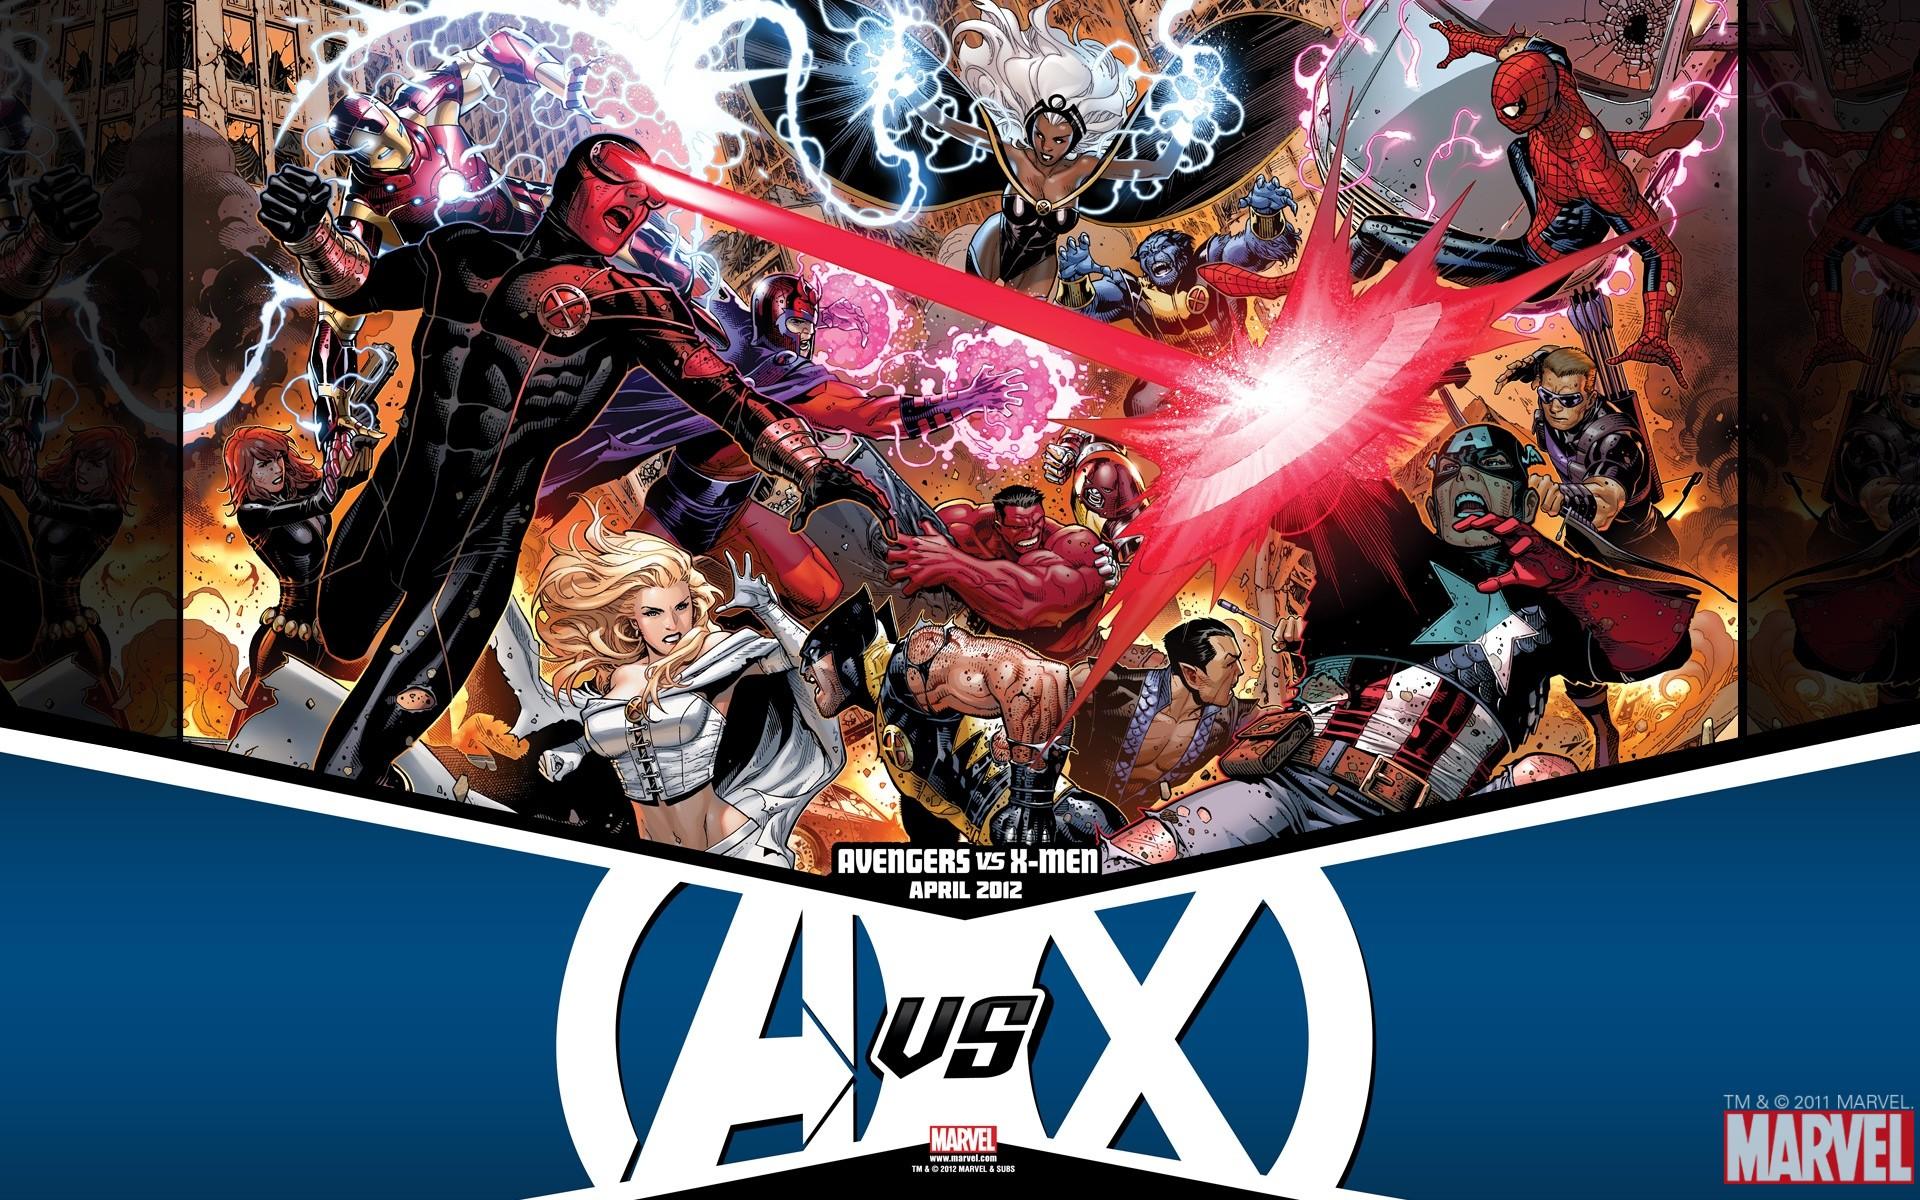 Beautiful Wallpaper Marvel Xmen - wallpaper_widescreen  Graphic_40911.jpg